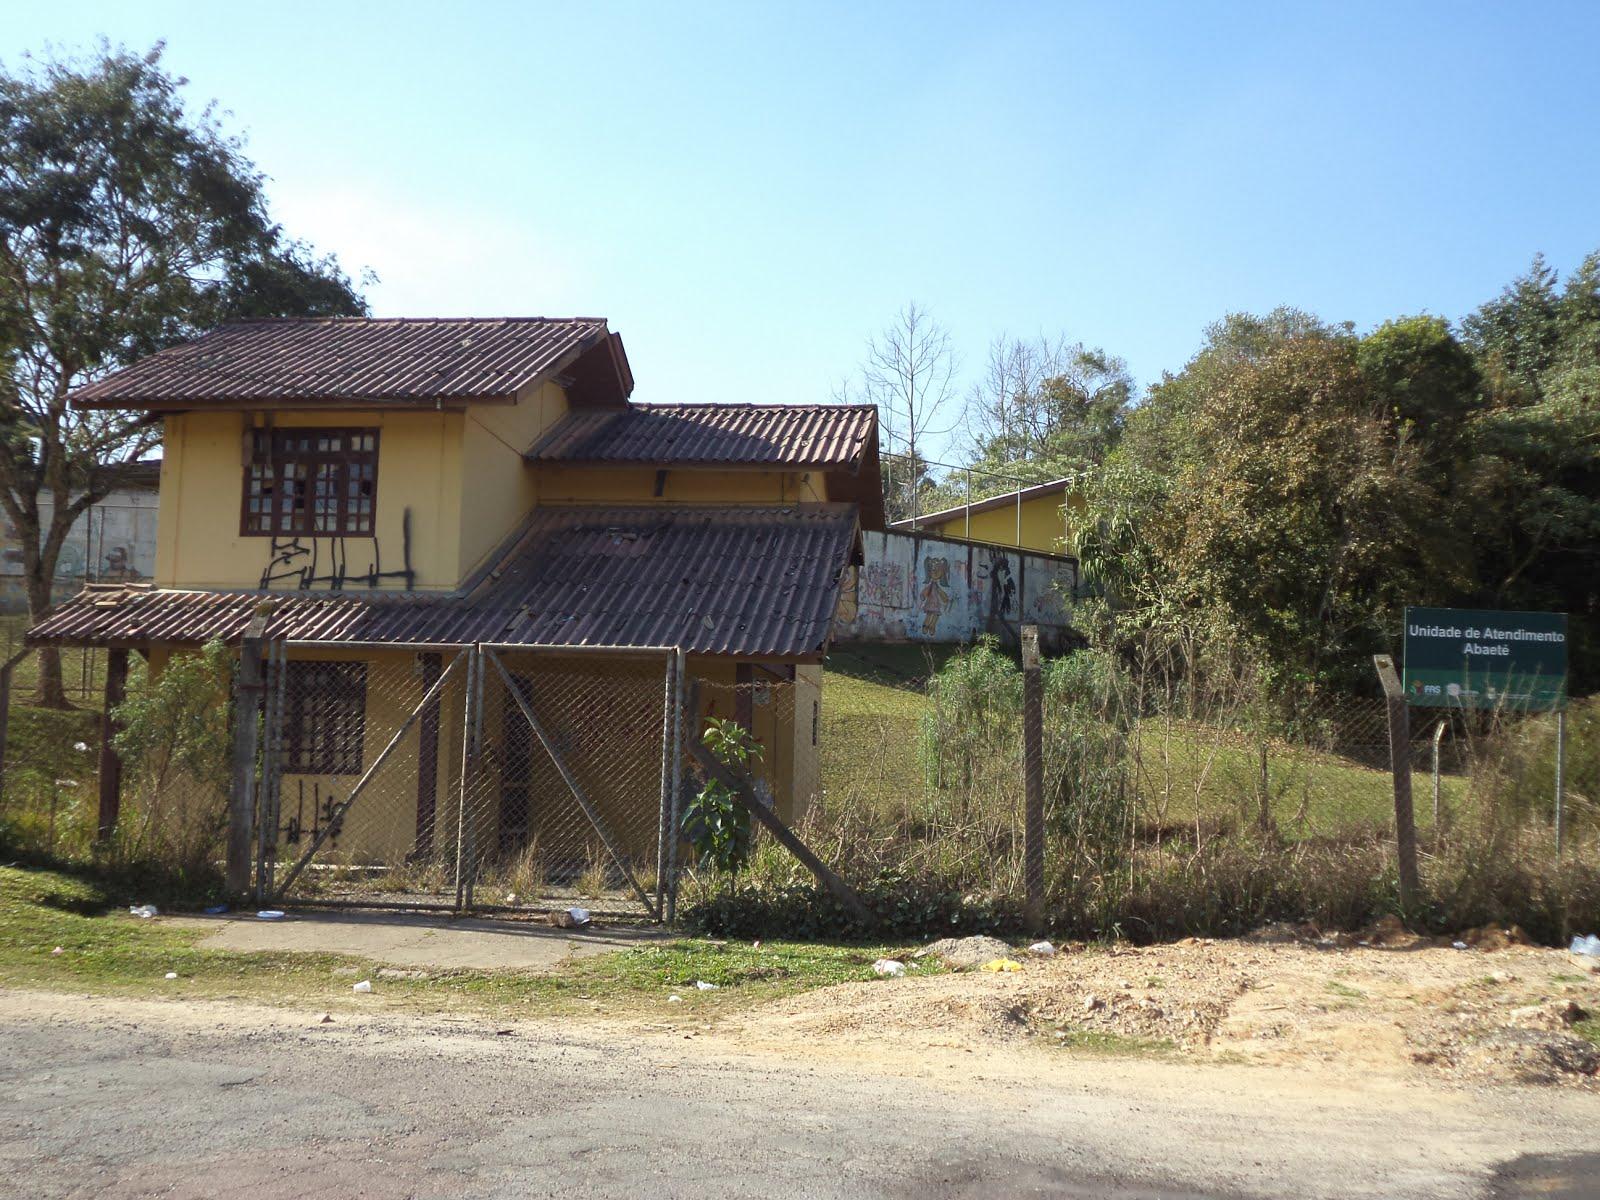 casa da comunidade no santa cândida